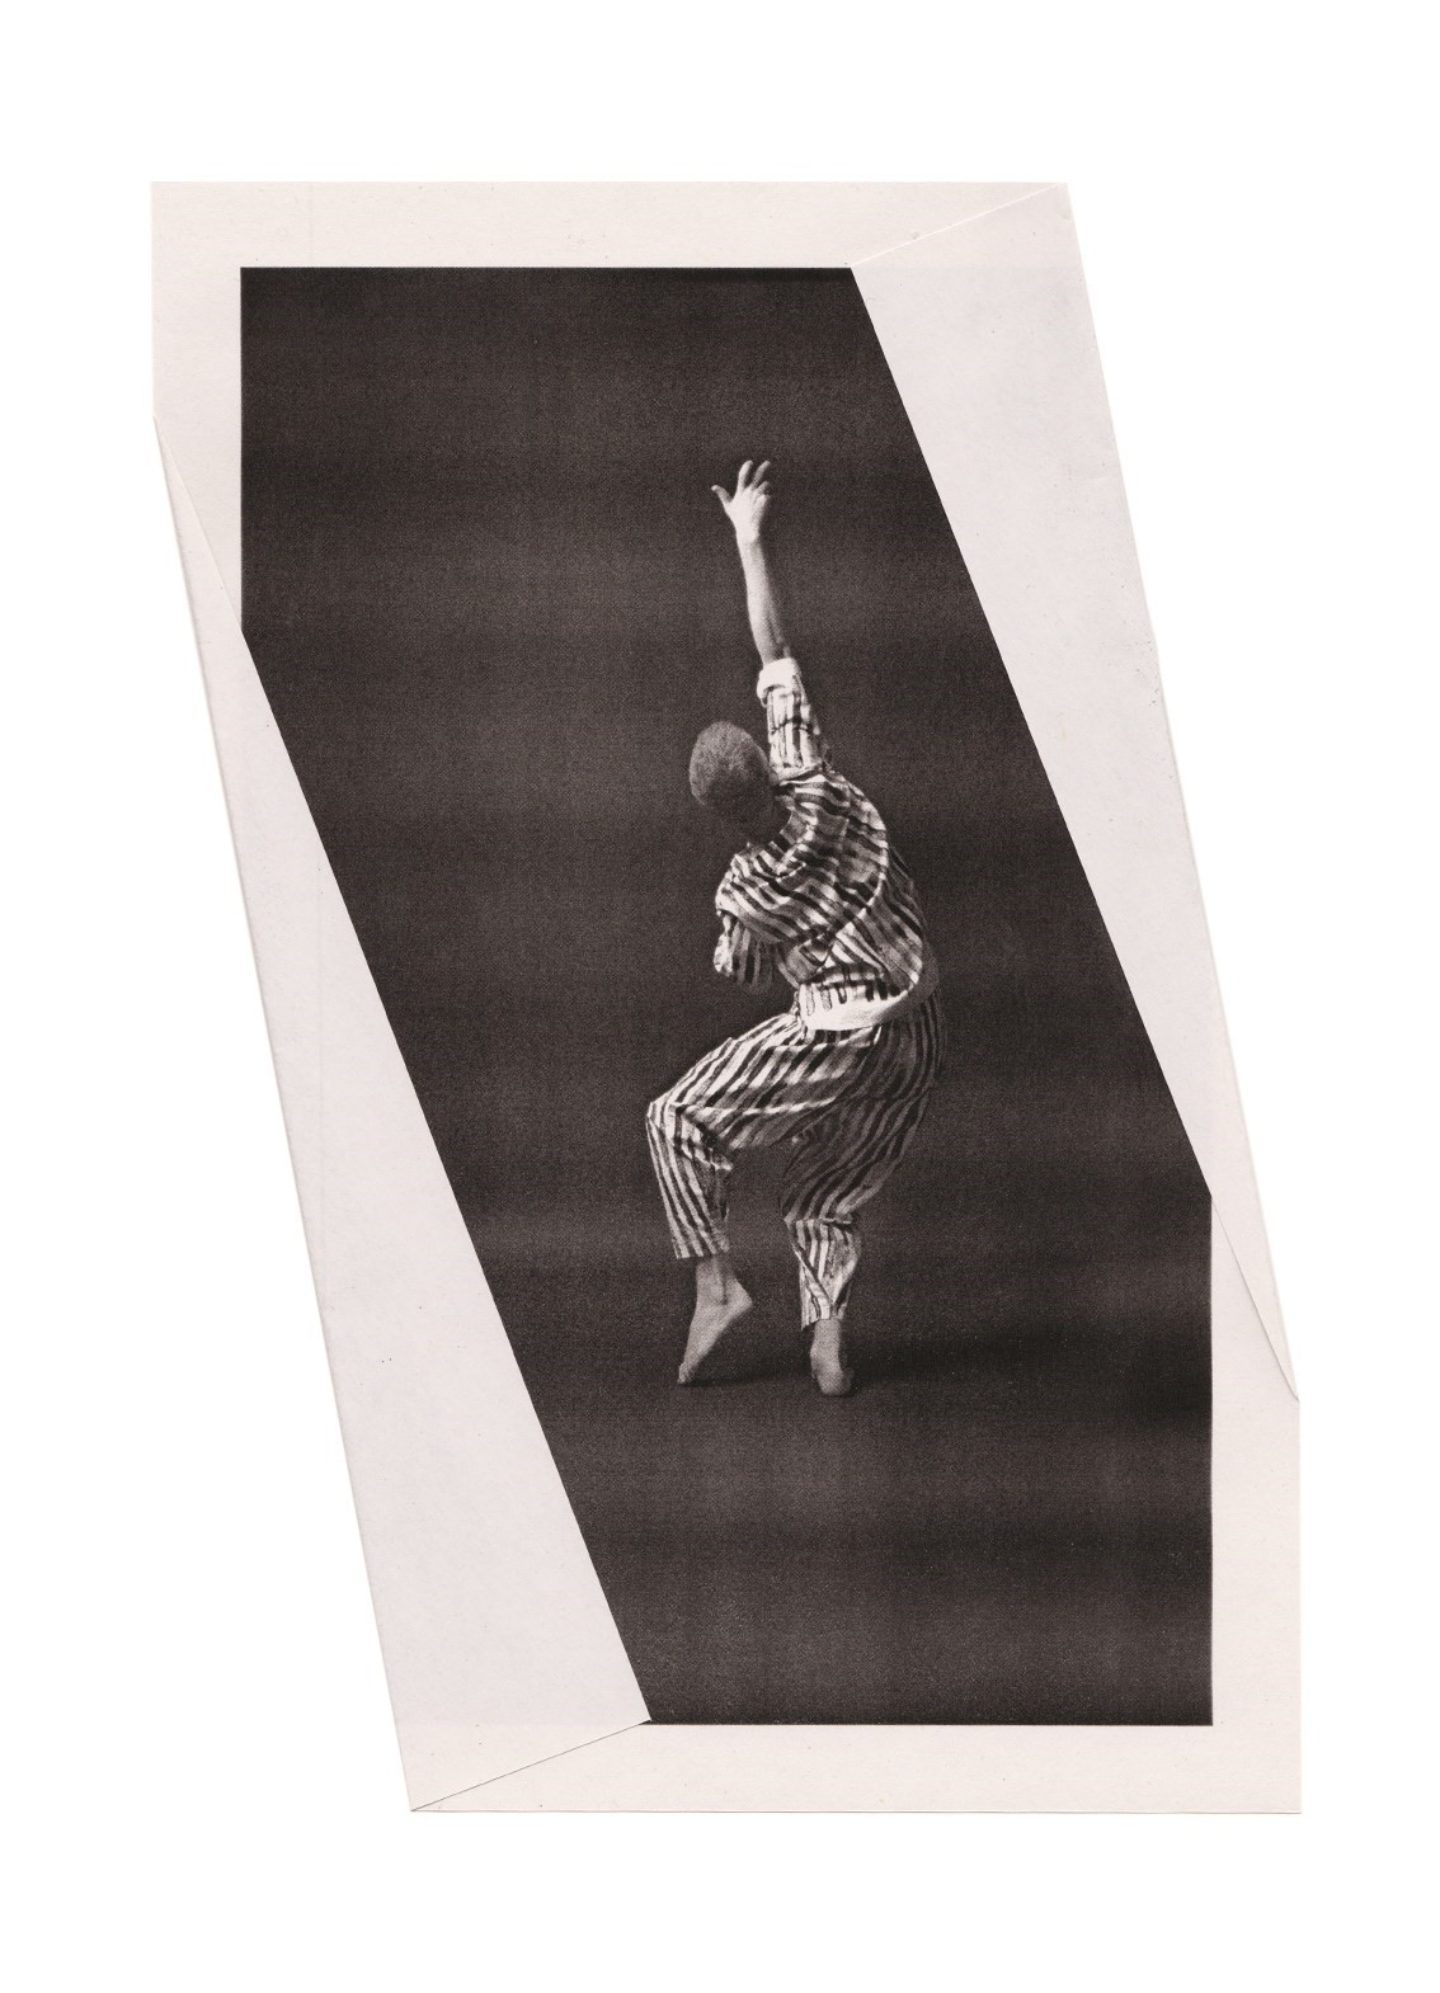 IGNANT-Art-Paul-Phung-Bruce-Usher-Dance-8